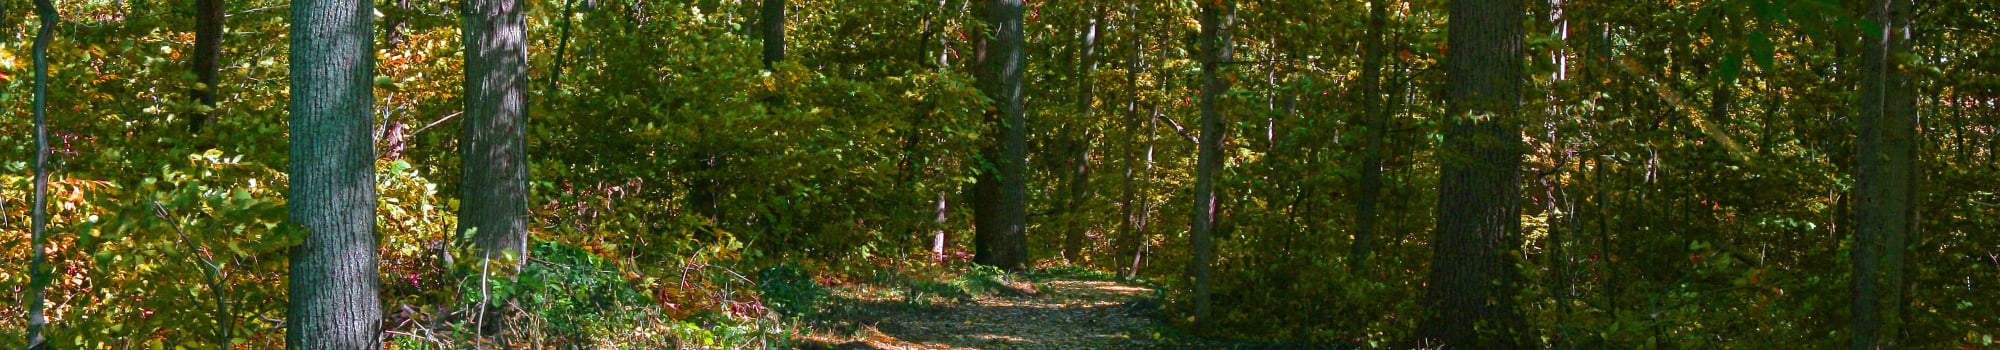 Join the Beztak team at Muirwood in Farmington Hills, Michigan